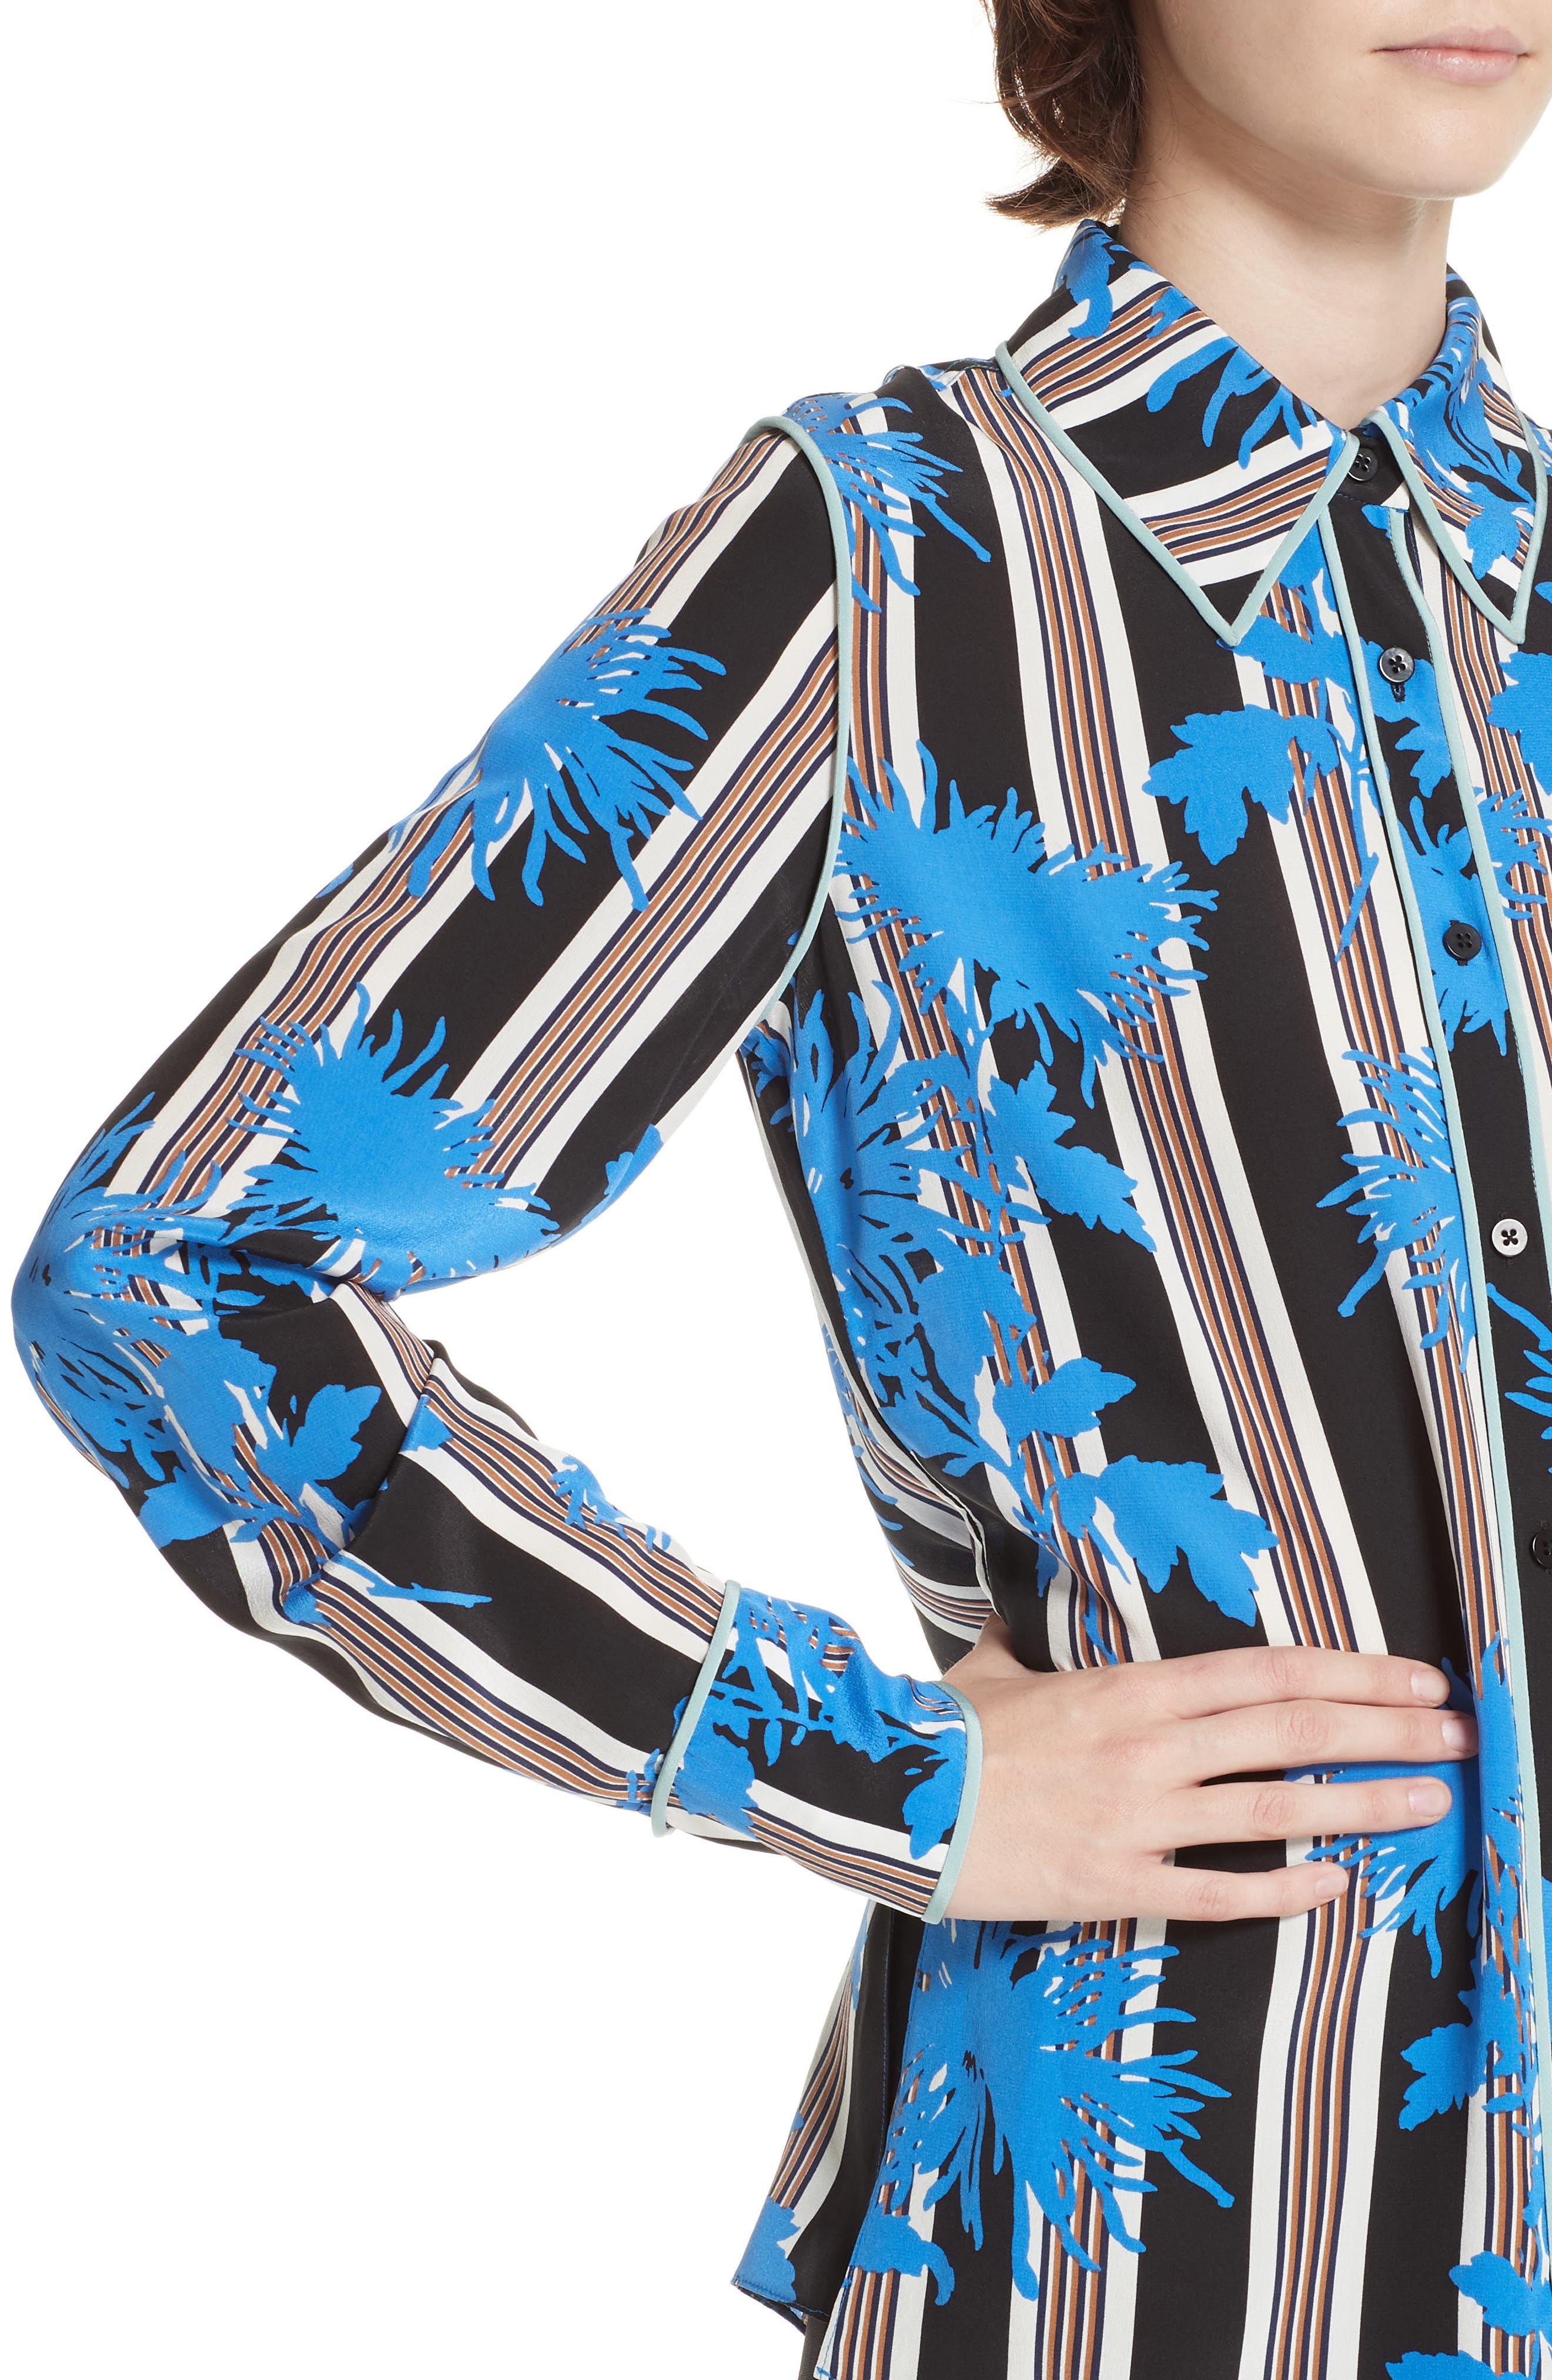 Diane von Furstenberg Floral Print Silk Shirt,                             Alternate thumbnail 4, color,                             SHELFORD B